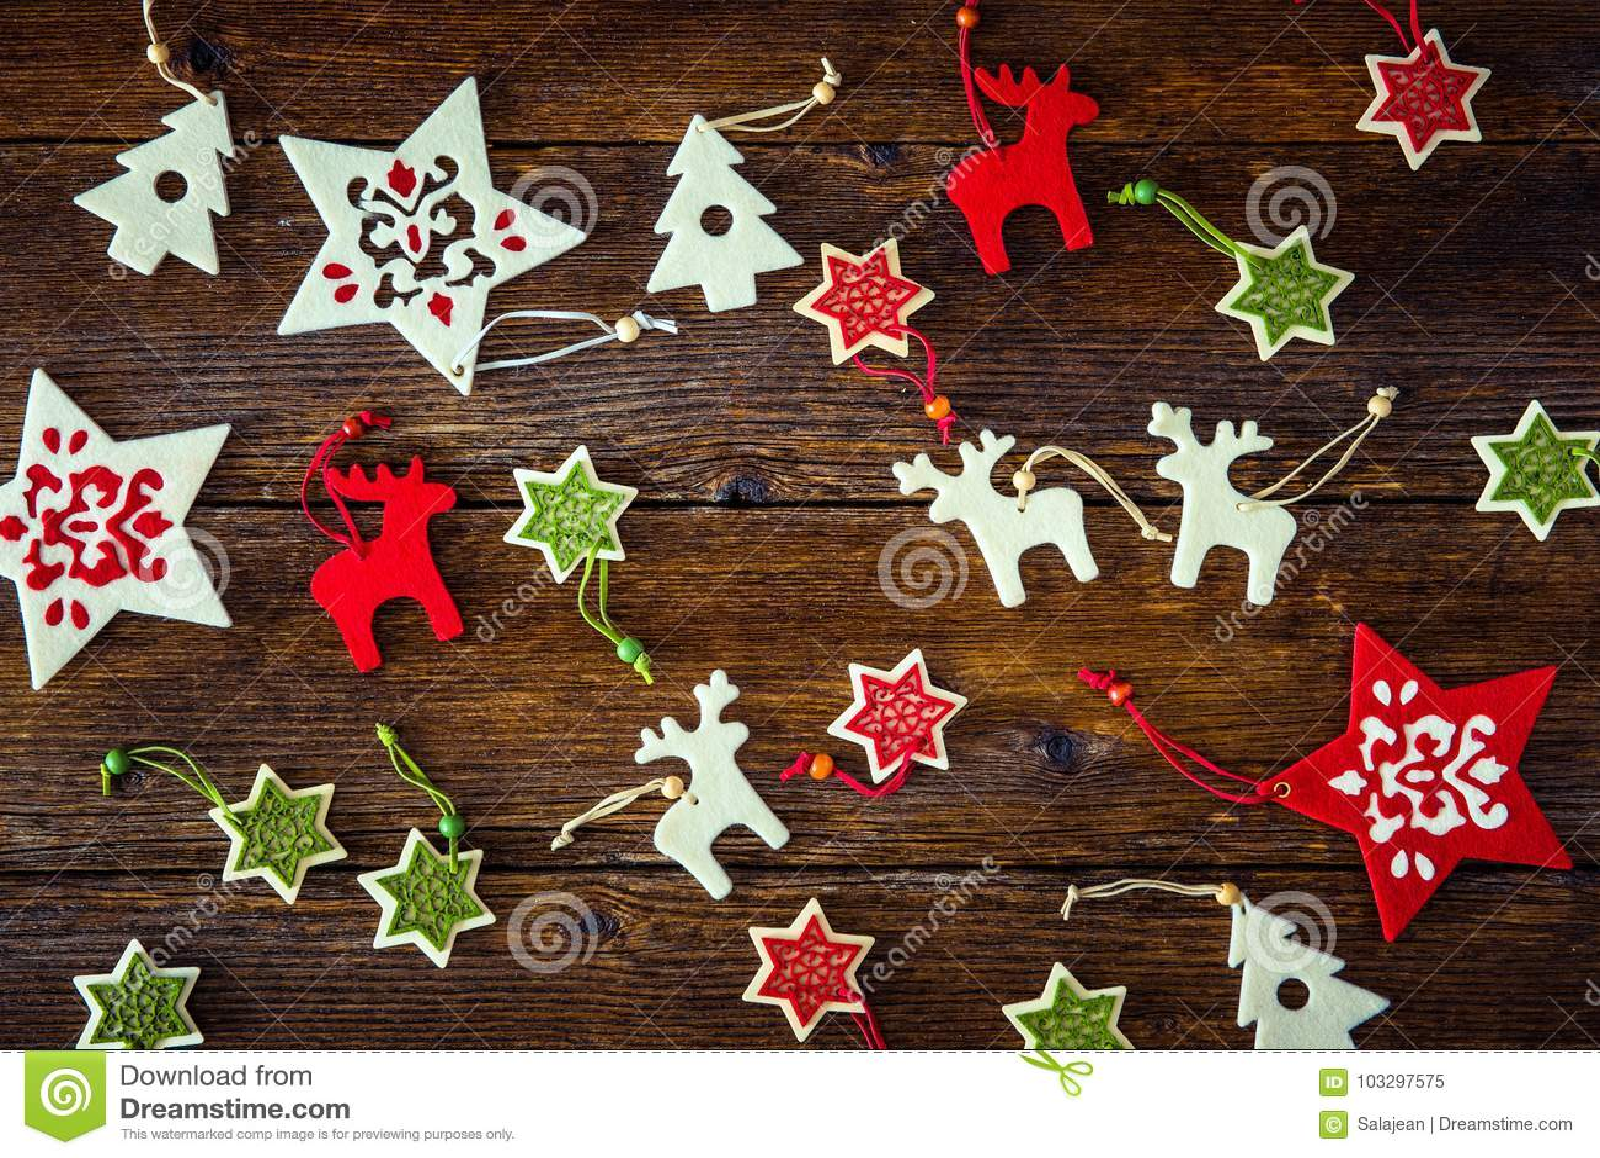 Collection of handmade Christmas ornaments